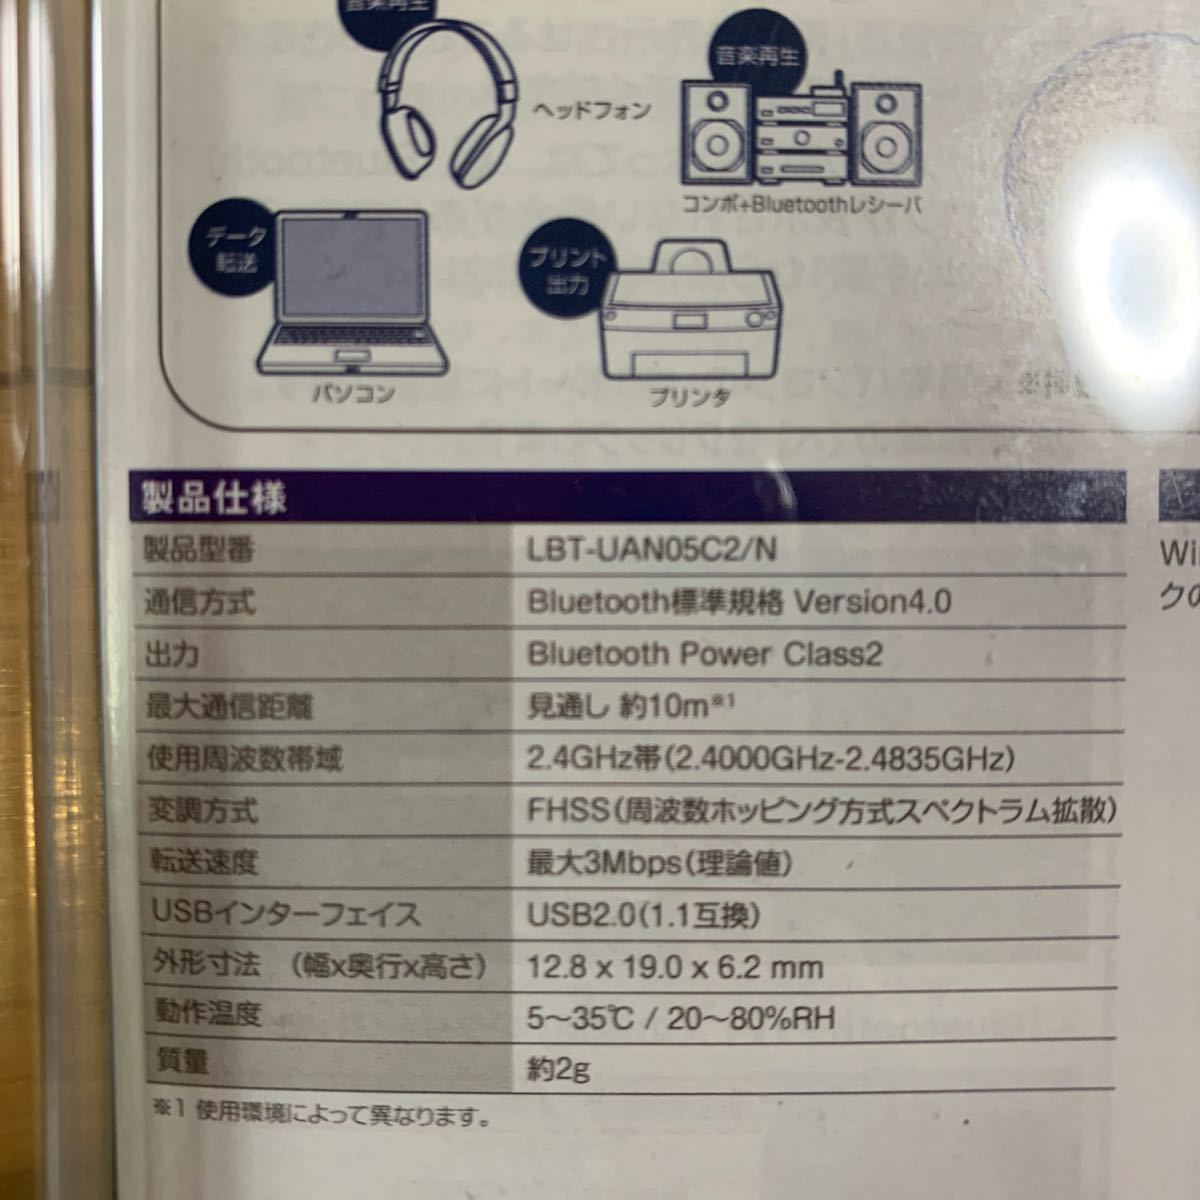 Bluetooth USBアダプタ LBT-UAN05C2 エレコム ELECOM Windows10  ブルートゥース